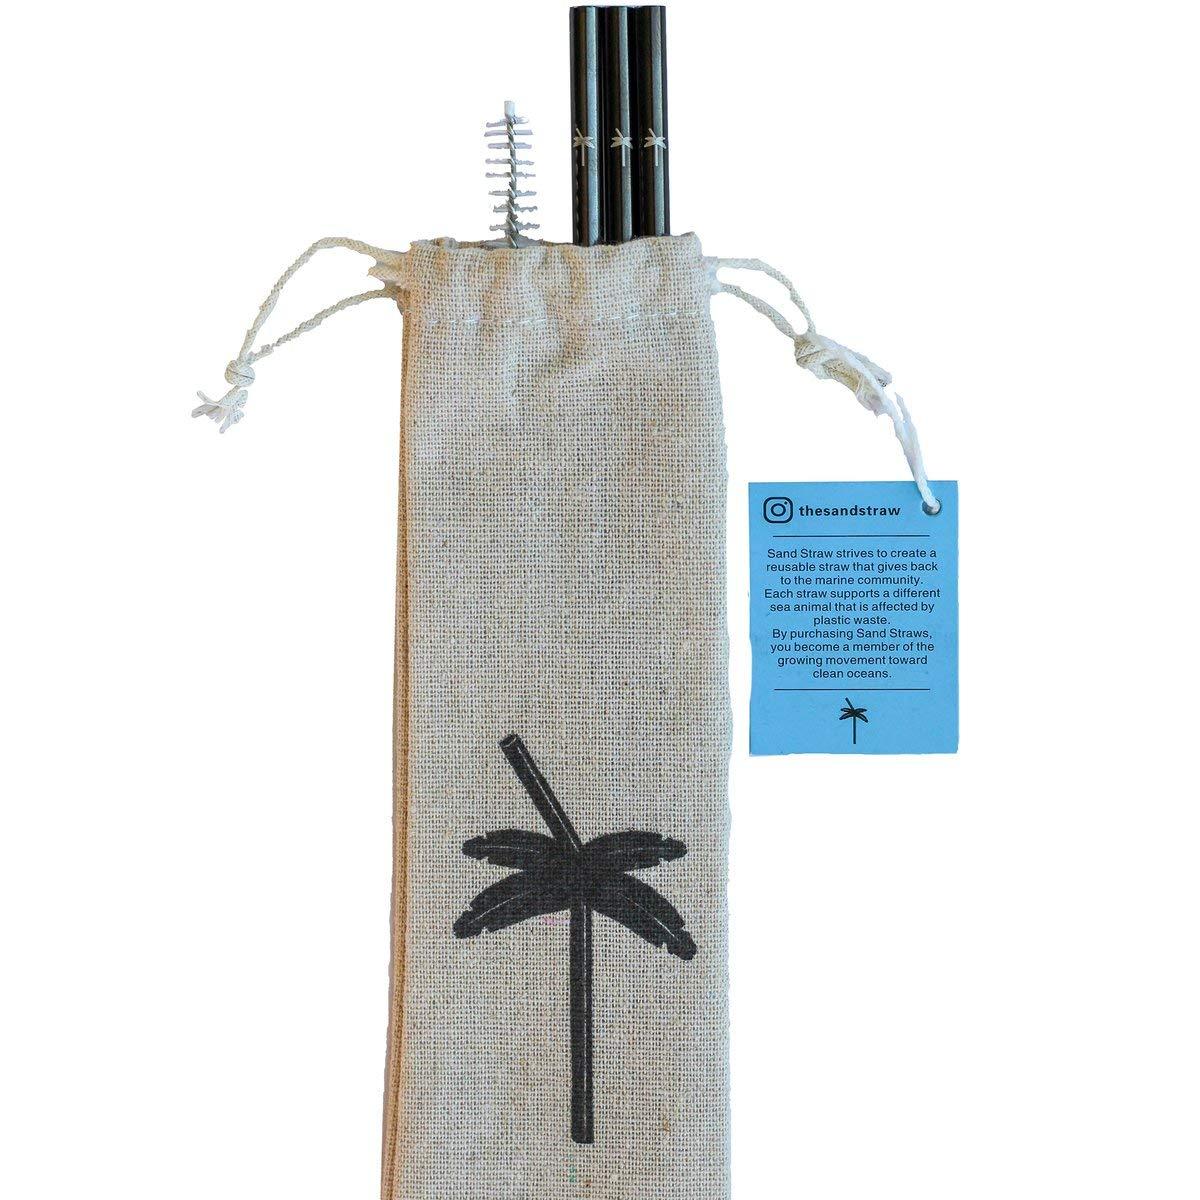 Amazon.com: Pajita de arena reutilizable de acero inoxidable ...